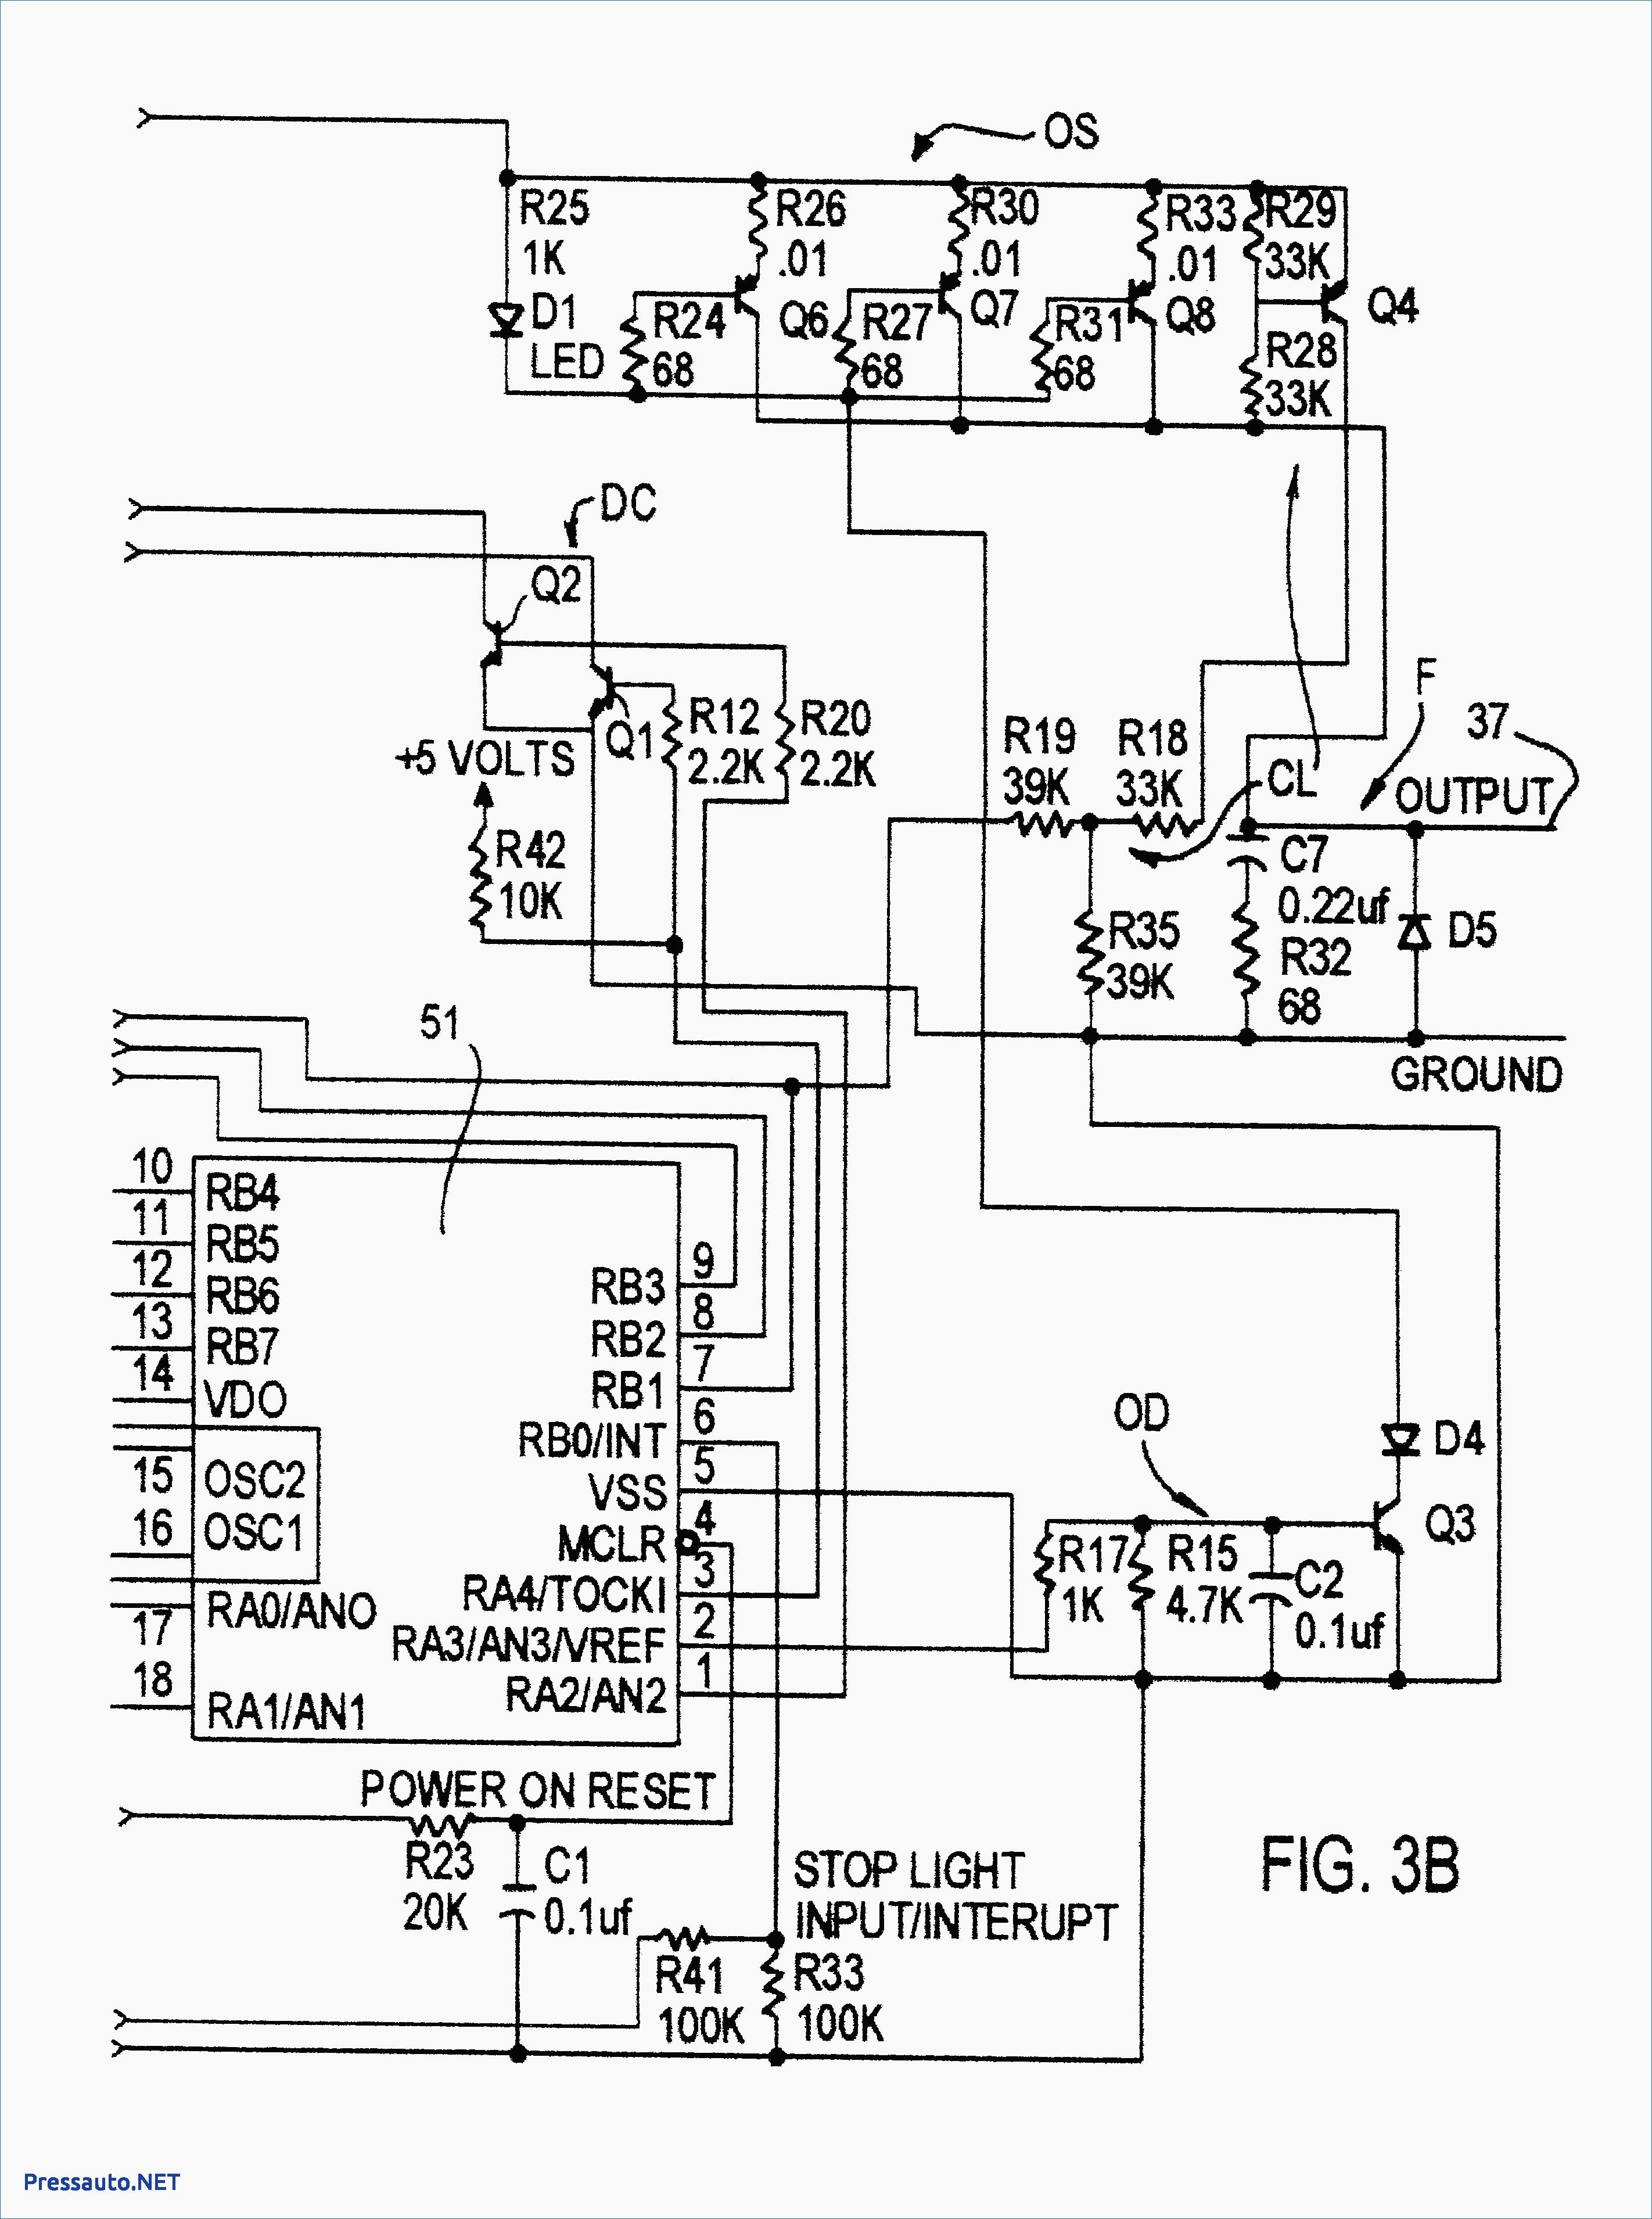 Ac Gear Motor Wiring Diagram Bodine Additionally Single Phase Electric Sew Auto Diagrams Instructions Fresh Leeson Newsc1stwiring